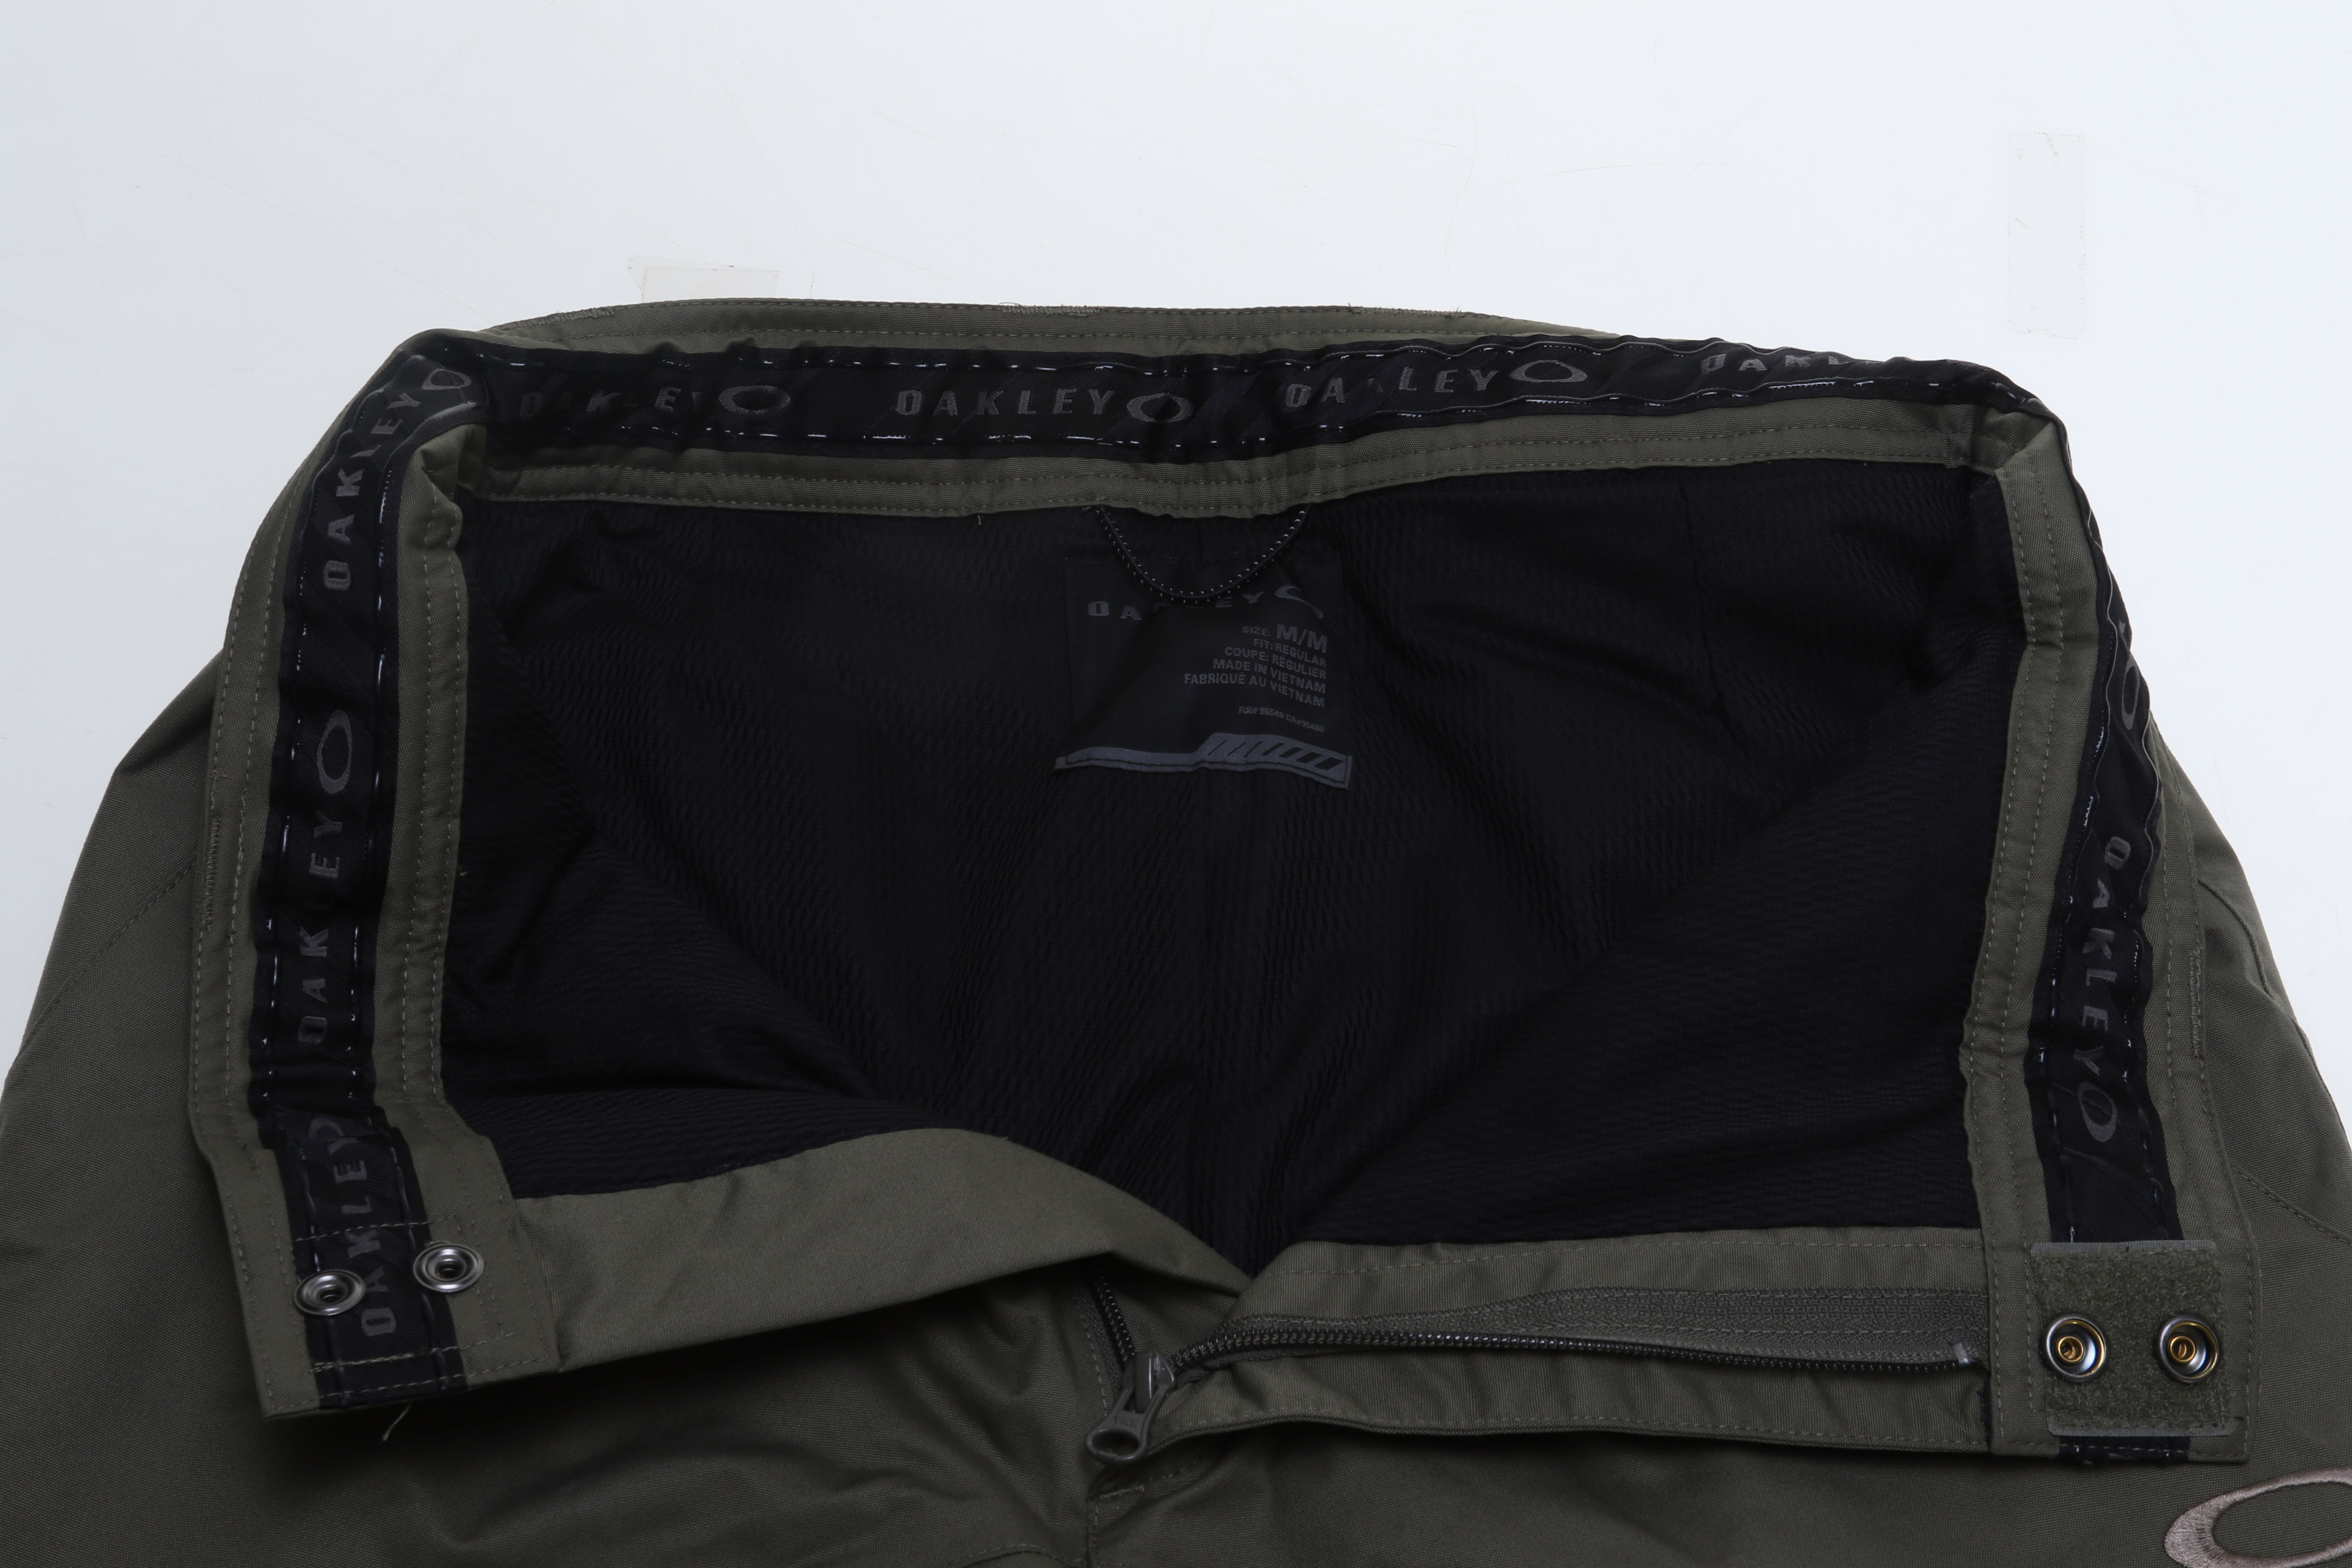 1dee8f3d96 Oakley Task Force Insulated Cargo Pants - Bitterroot Public Library